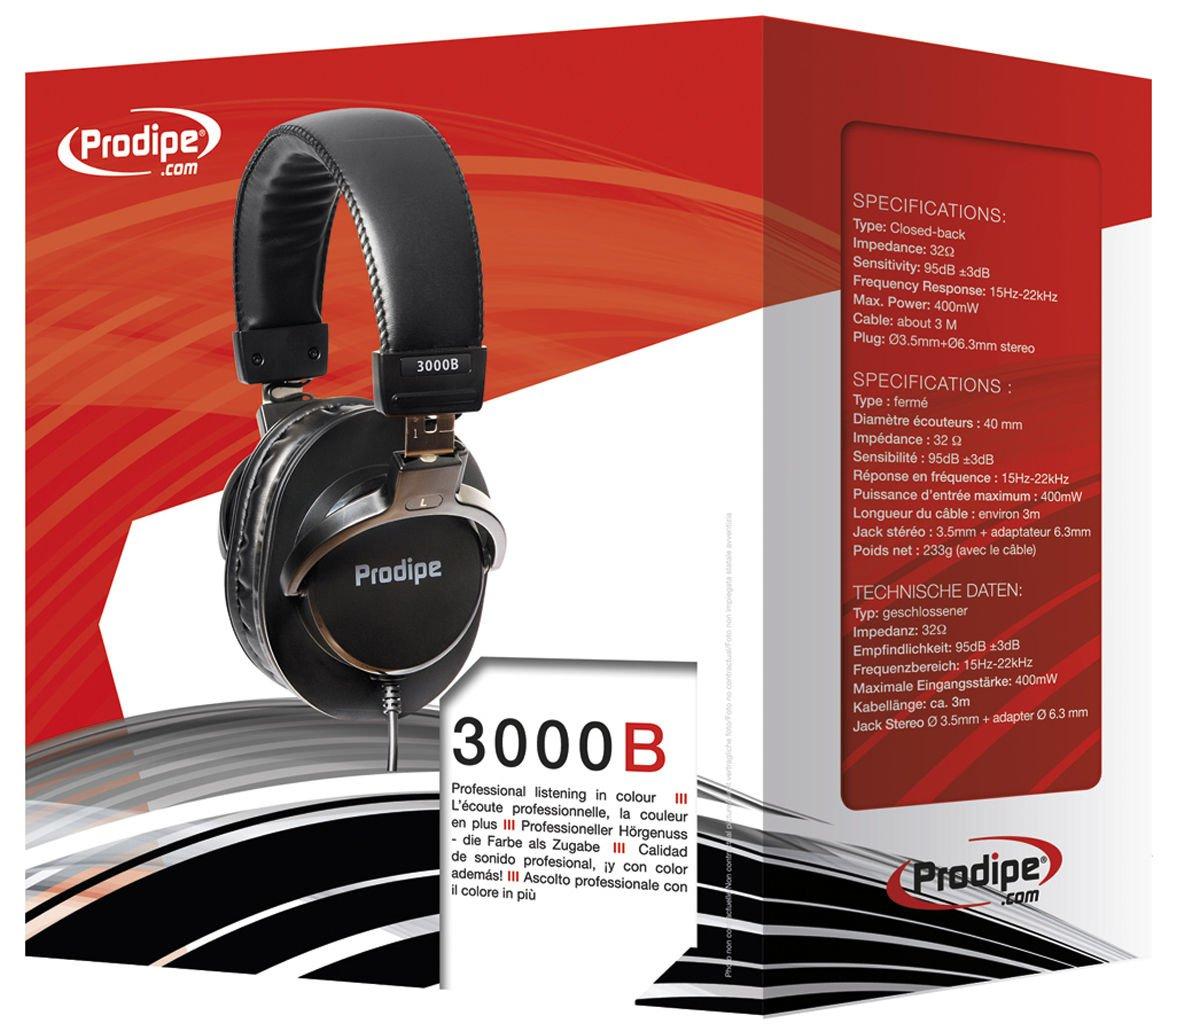 Prodipe 3000B - profesjonalne słuchawki studyjne